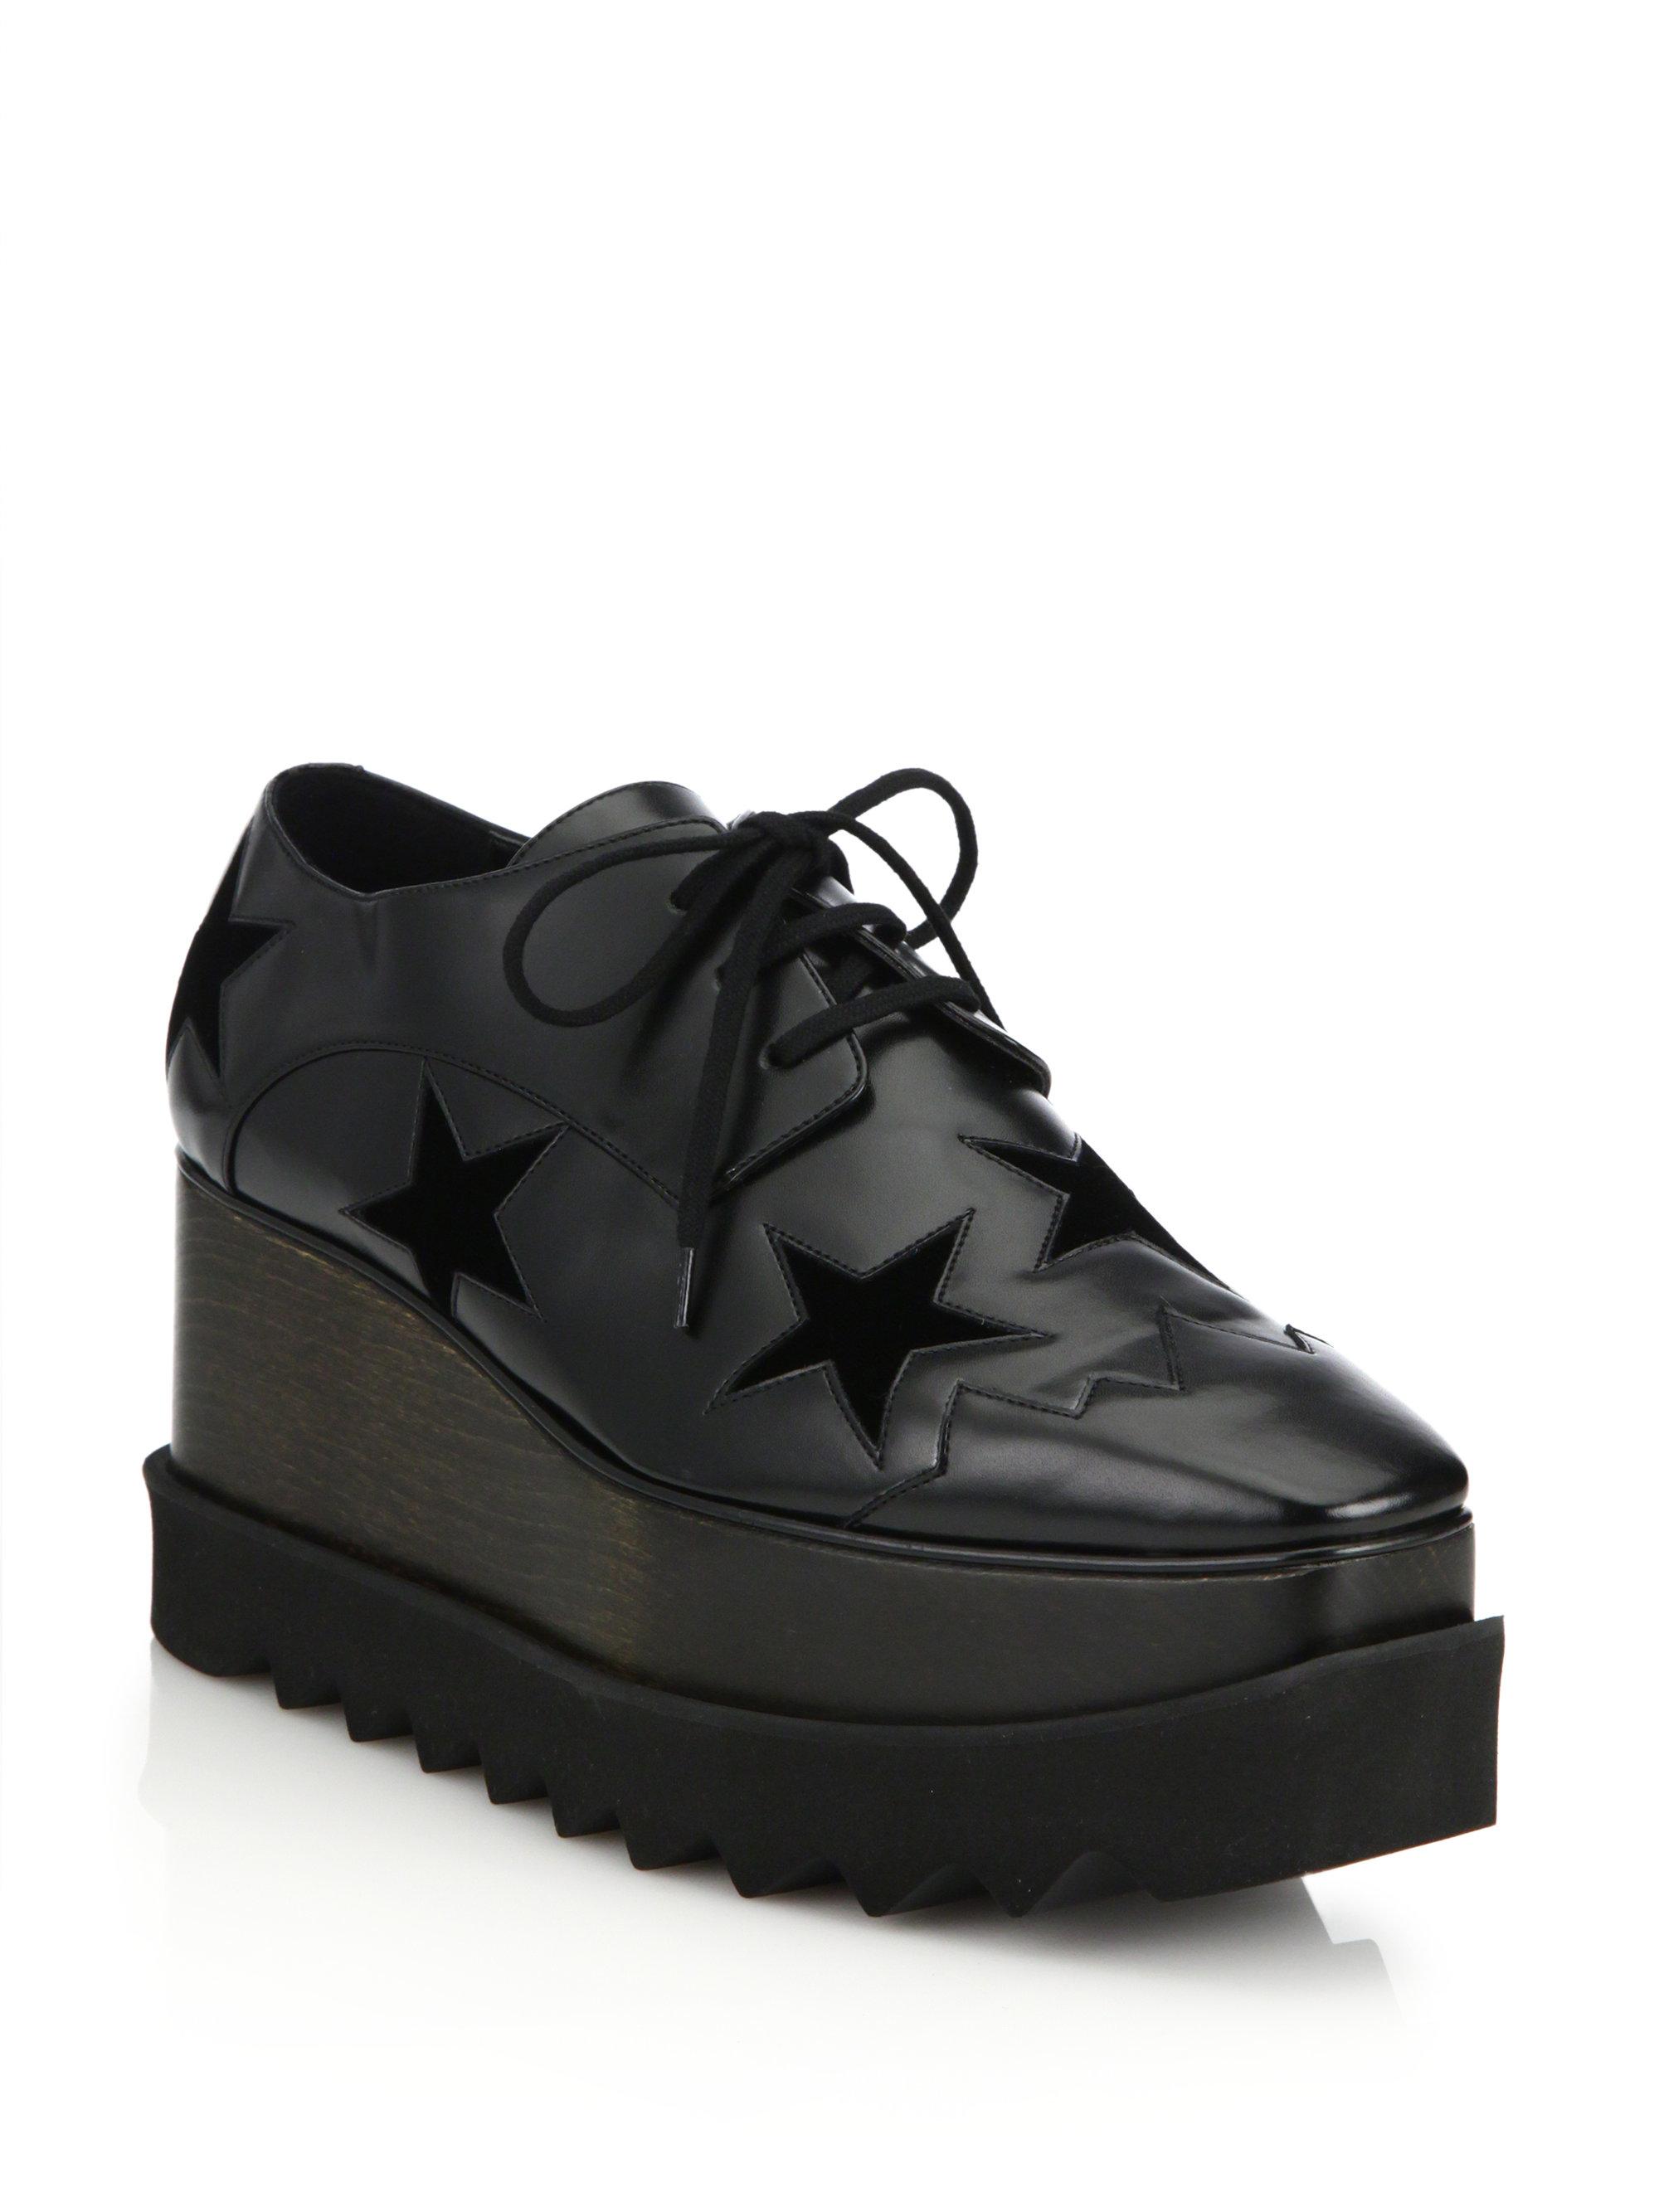 star embellished platform sneakers - White Stella McCartney kOv7qM